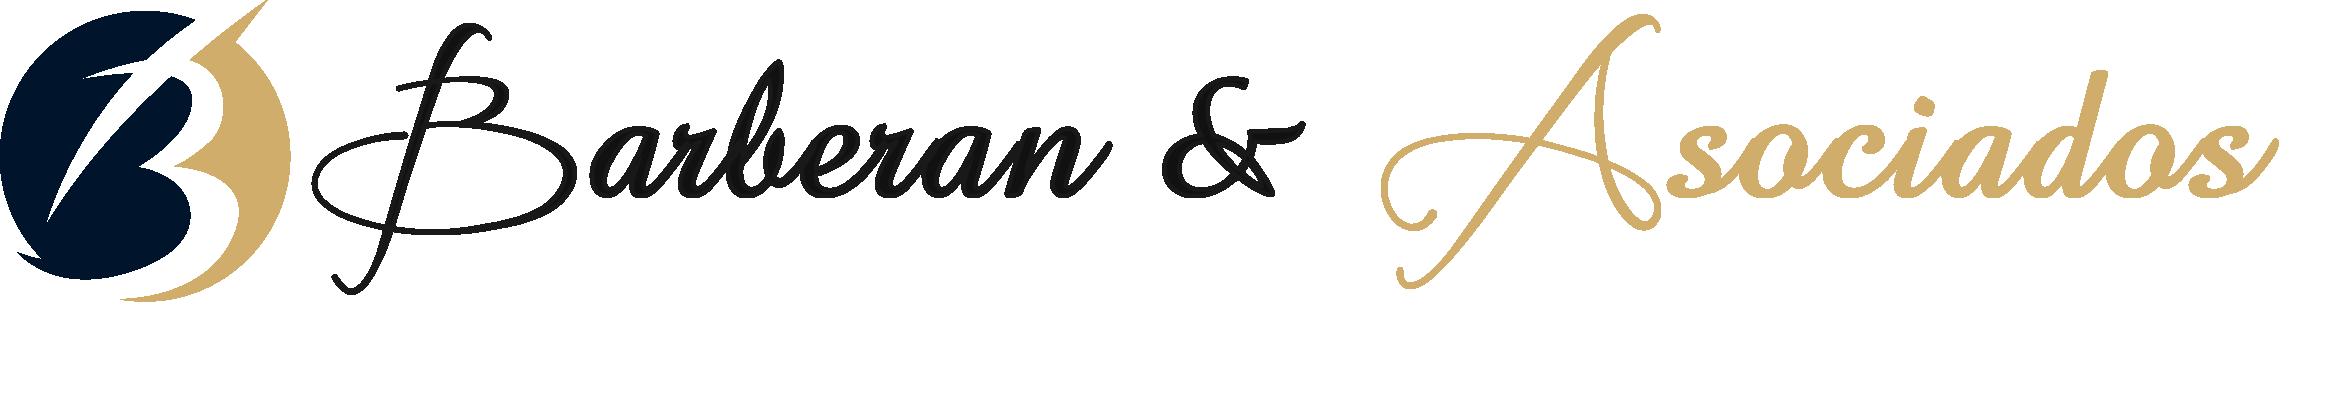 Barberan & Asociados